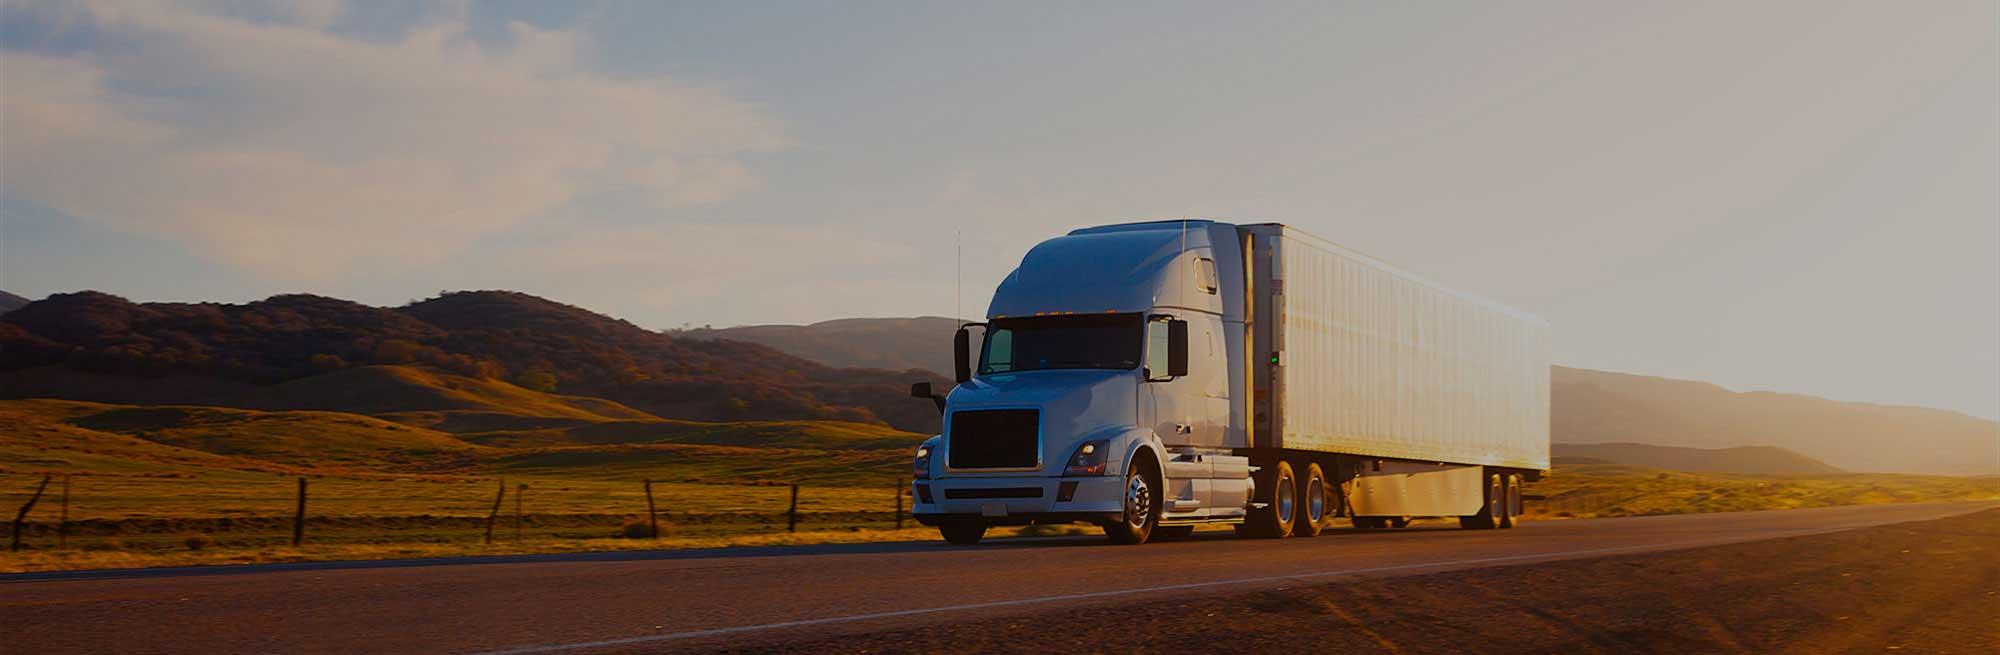 medium resolution of truck on highway at sunset california usa